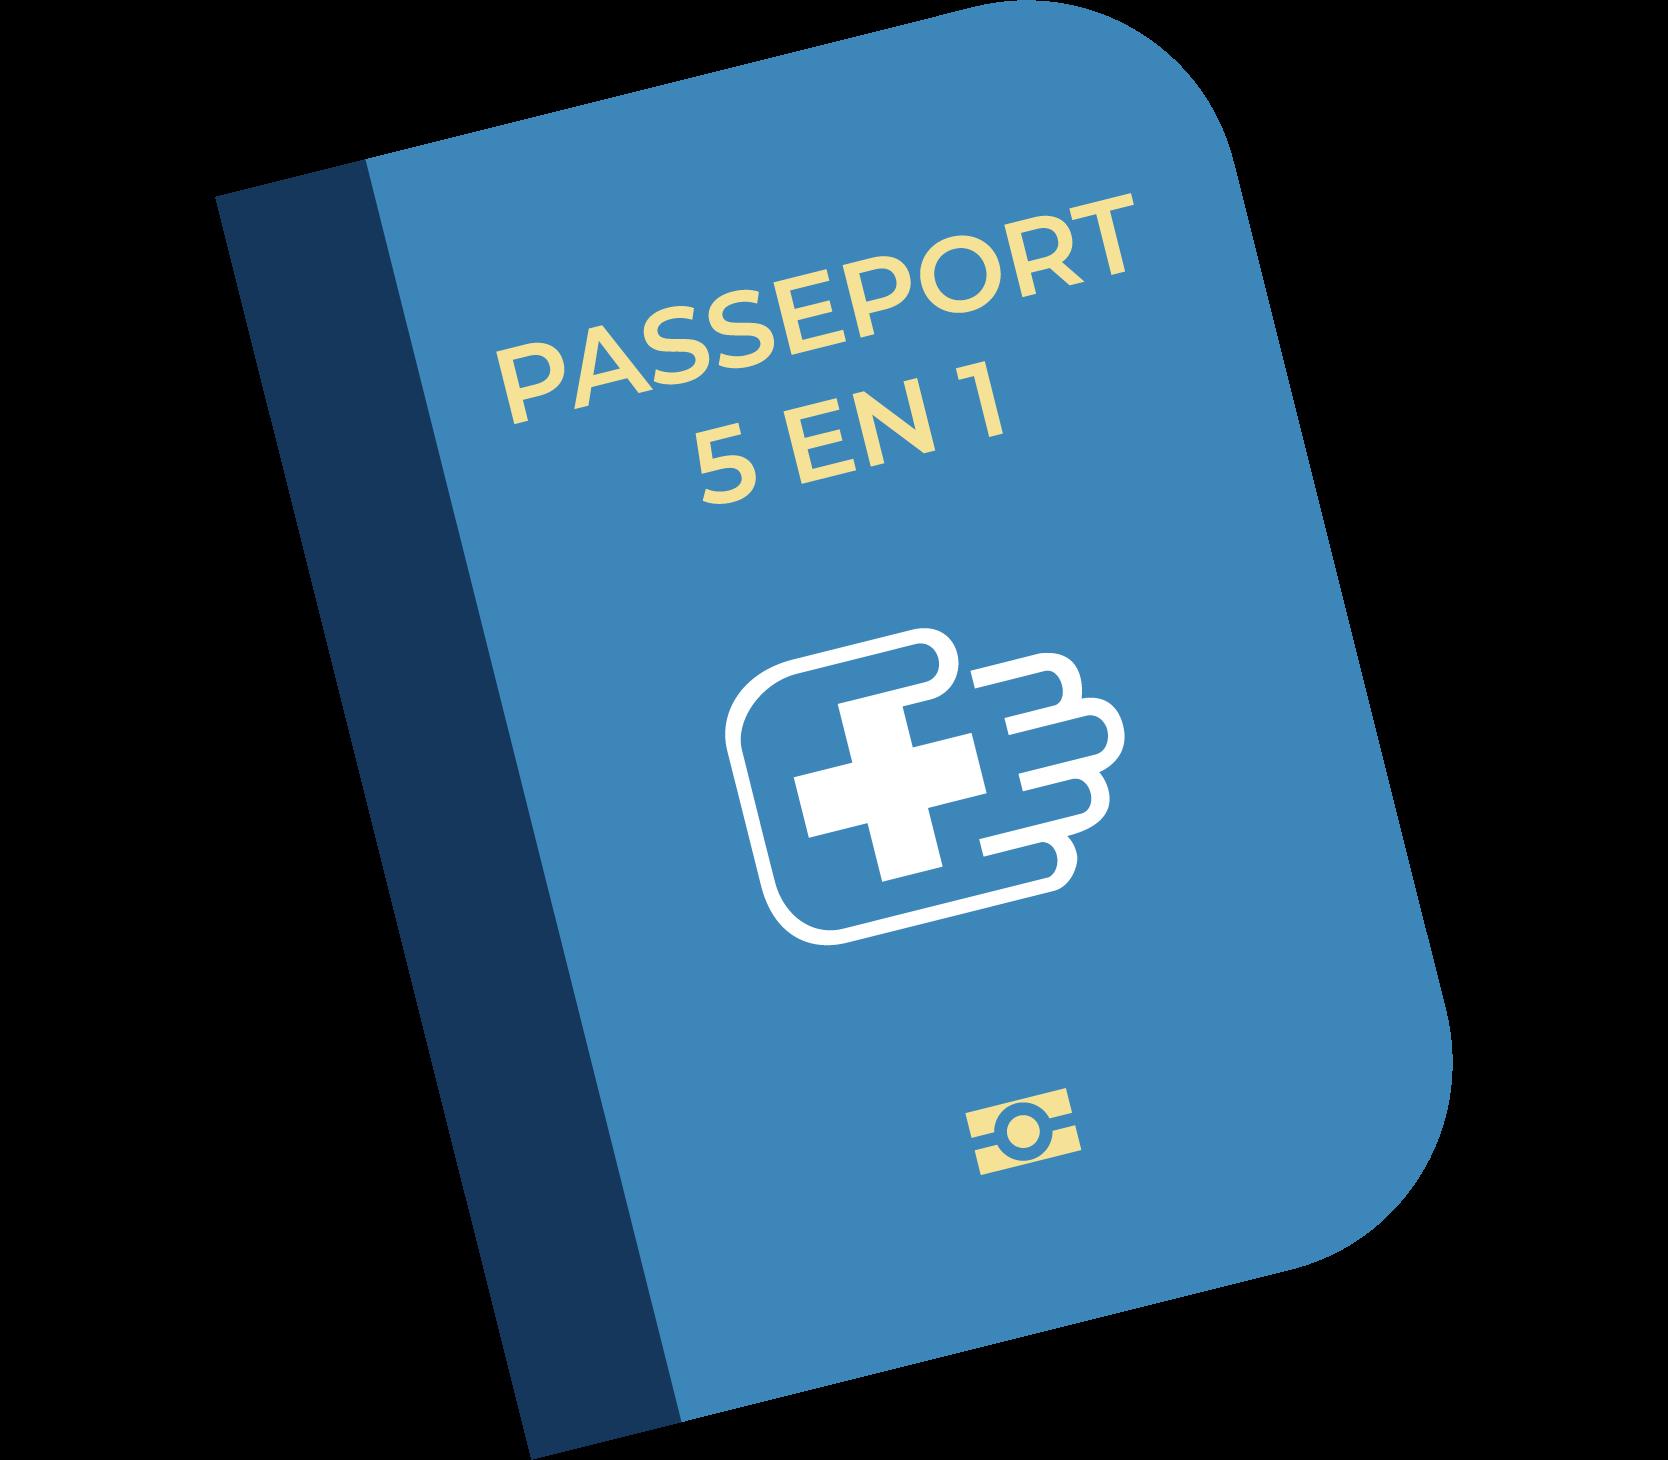 icone-passeport_passeportv.png#asset:19299